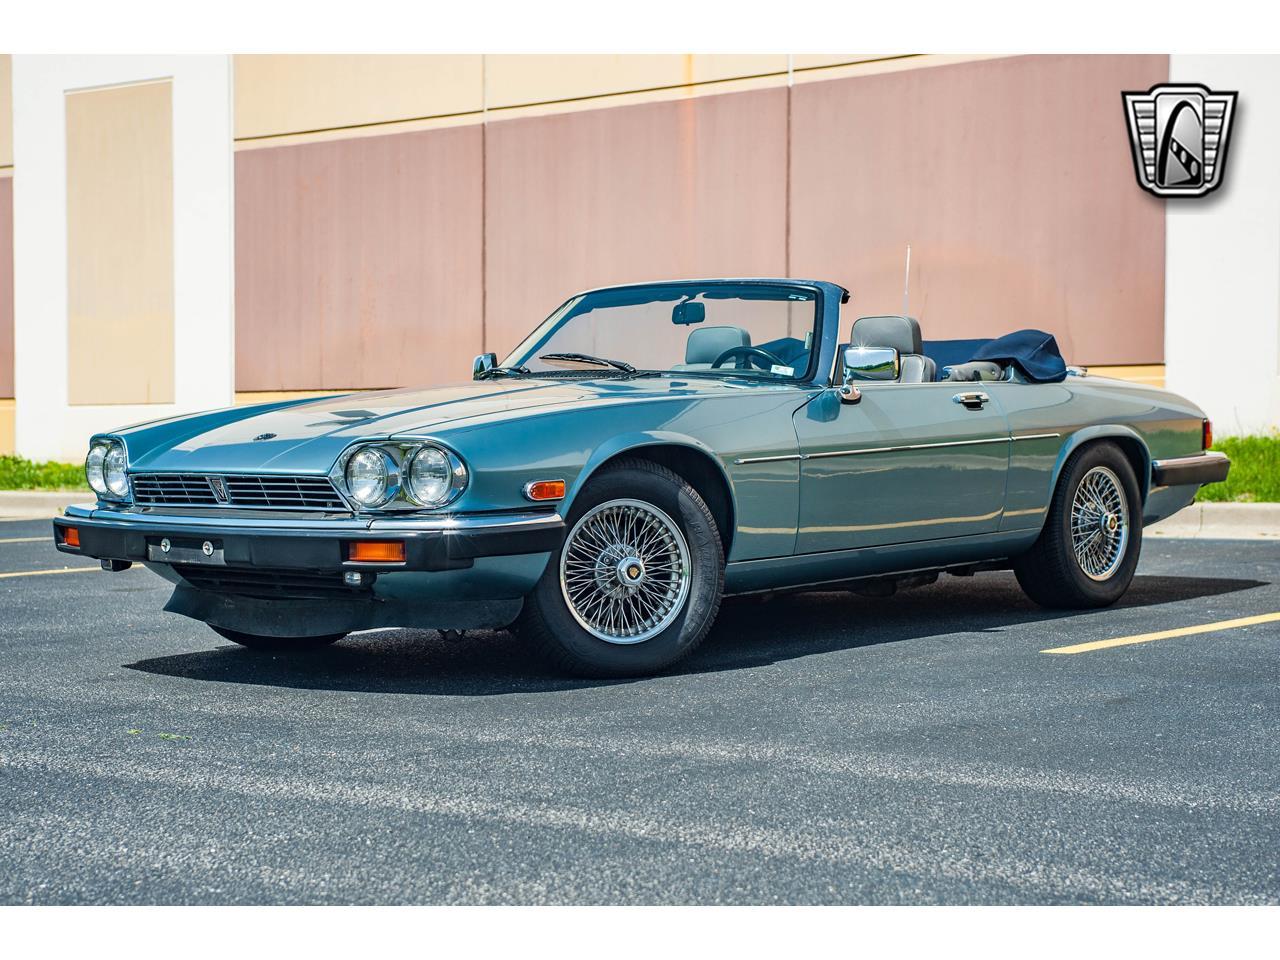 Large Picture of '90 Jaguar XJS located in O'Fallon Illinois - $15,500.00 - QB9E